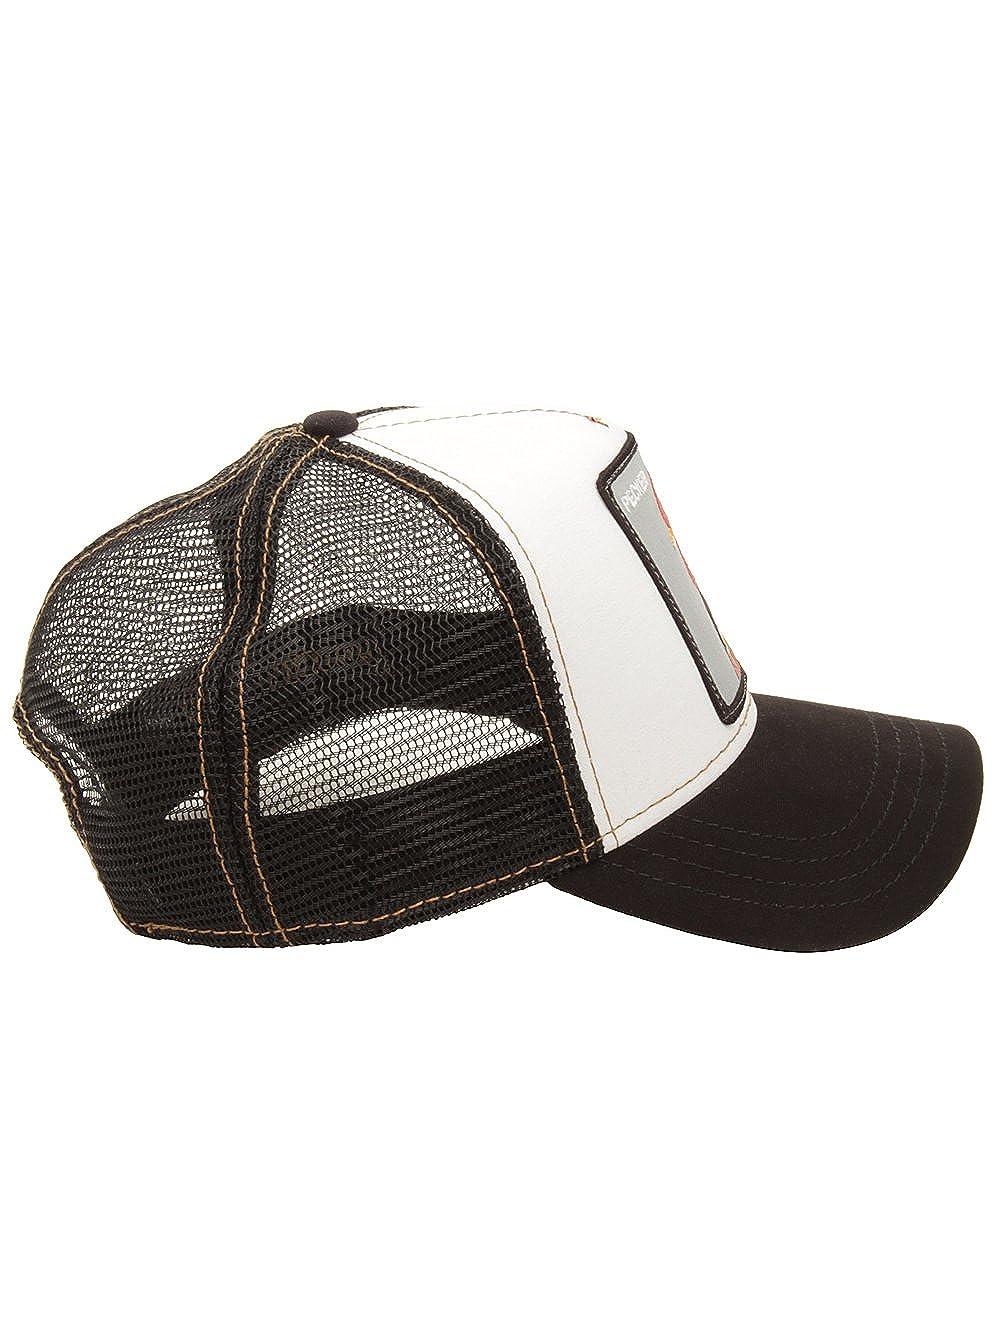 151d9a9780a6e Goorin Bros Men s  Pecker  Rooster Patch Plucker SnapbackTrucker Hat Cap ( Black)  Amazon.ca  Clothing   Accessories